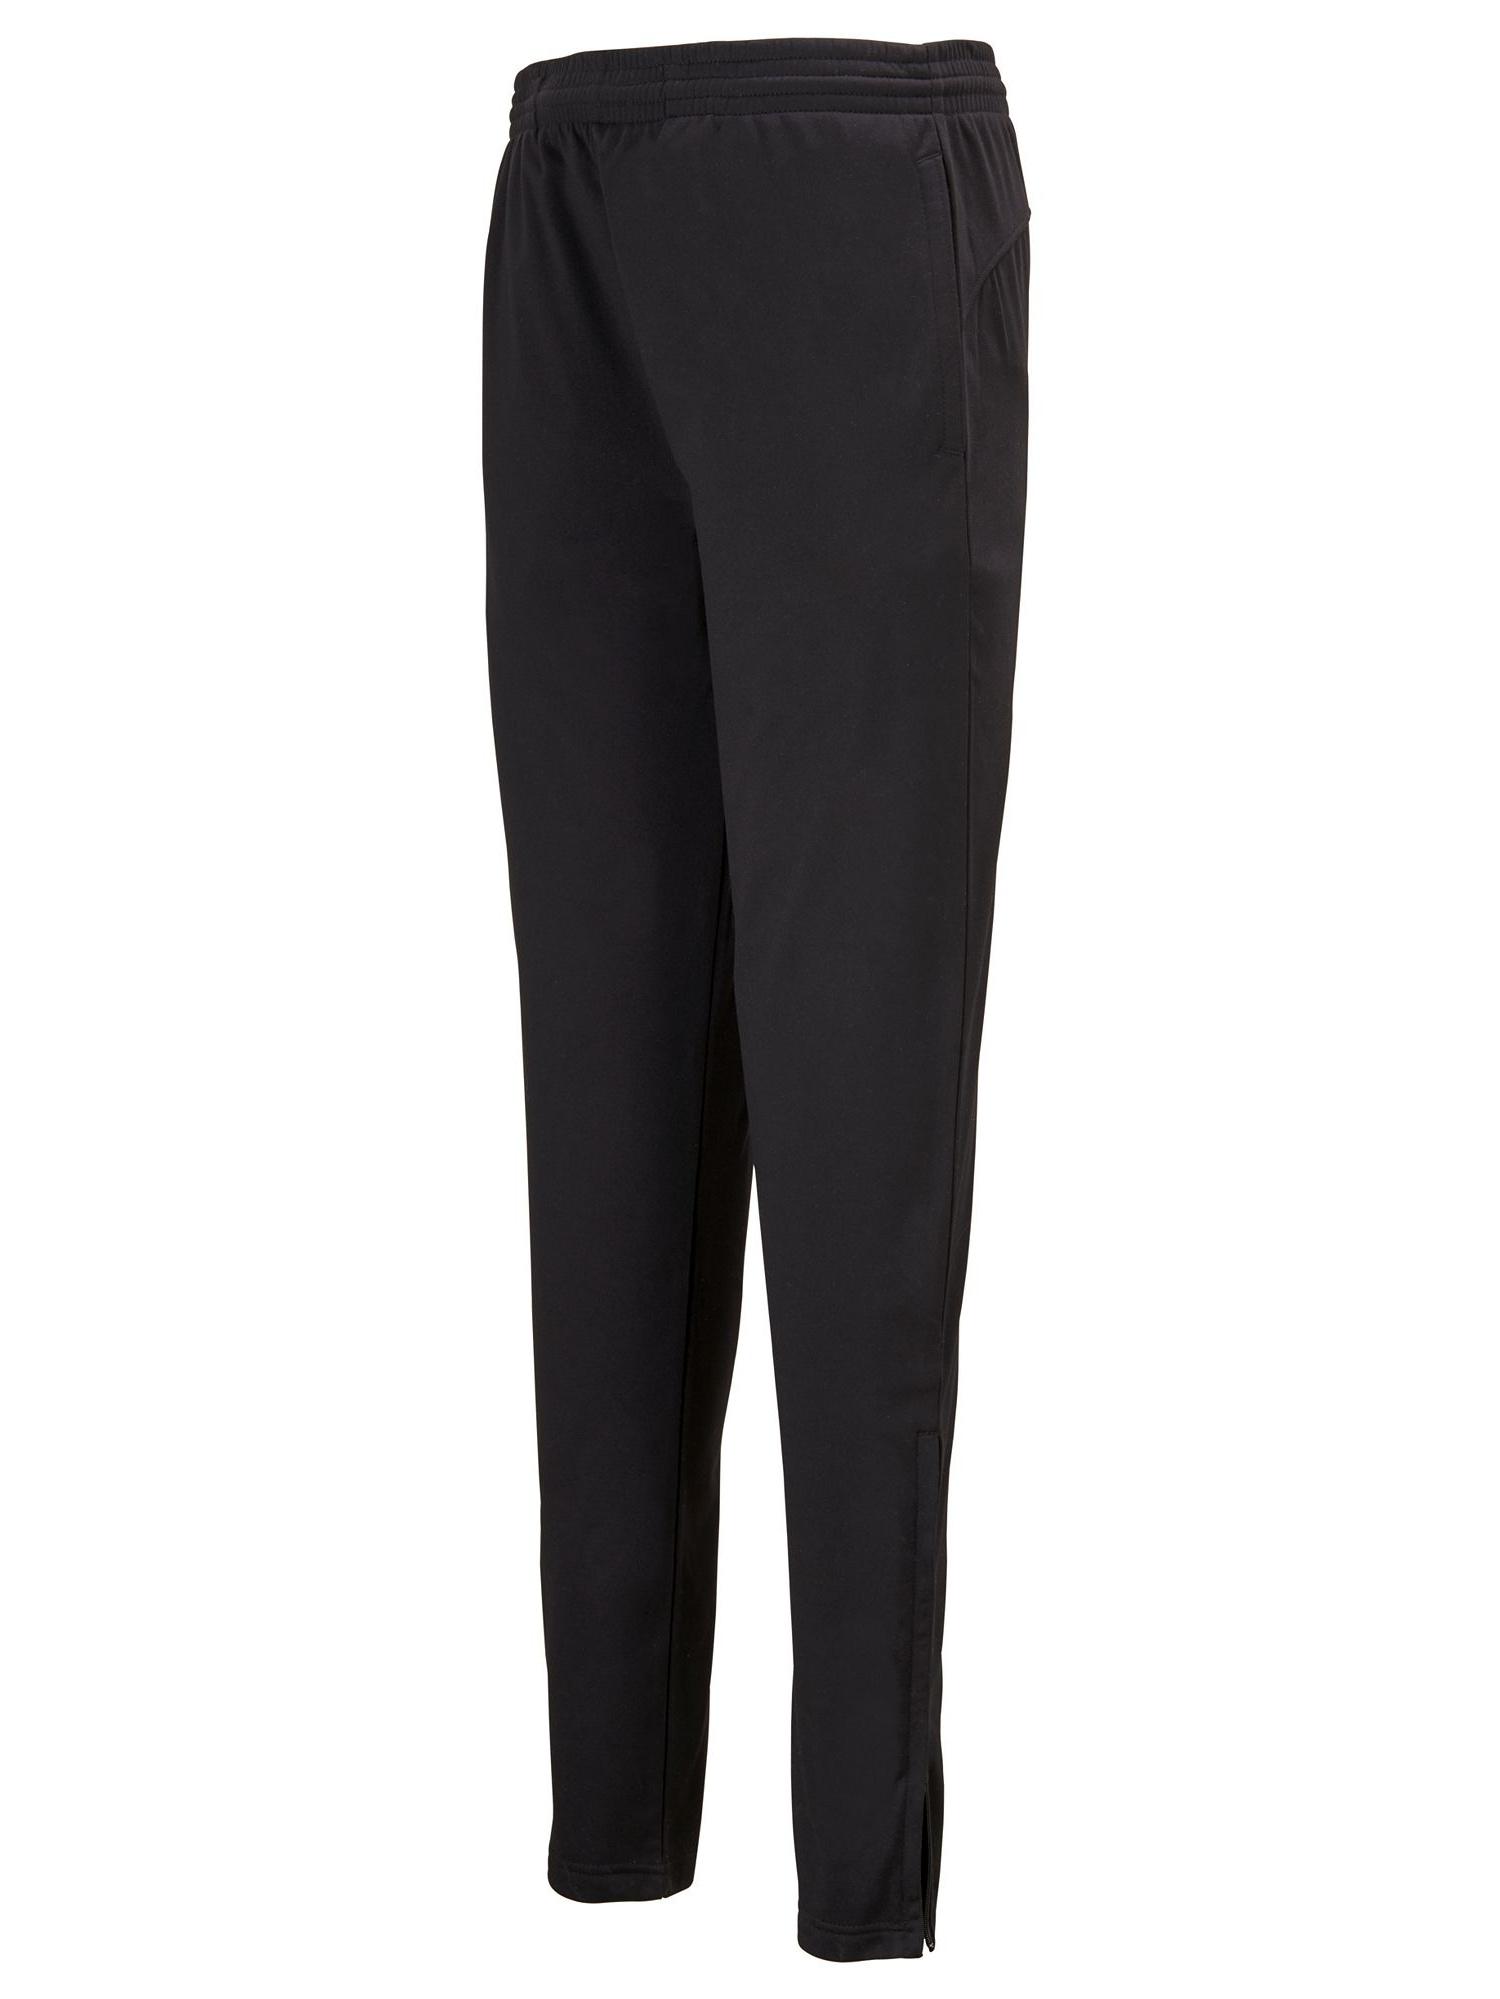 Augusta Sportswear L Boys Tapered Leg Pant Black 7732